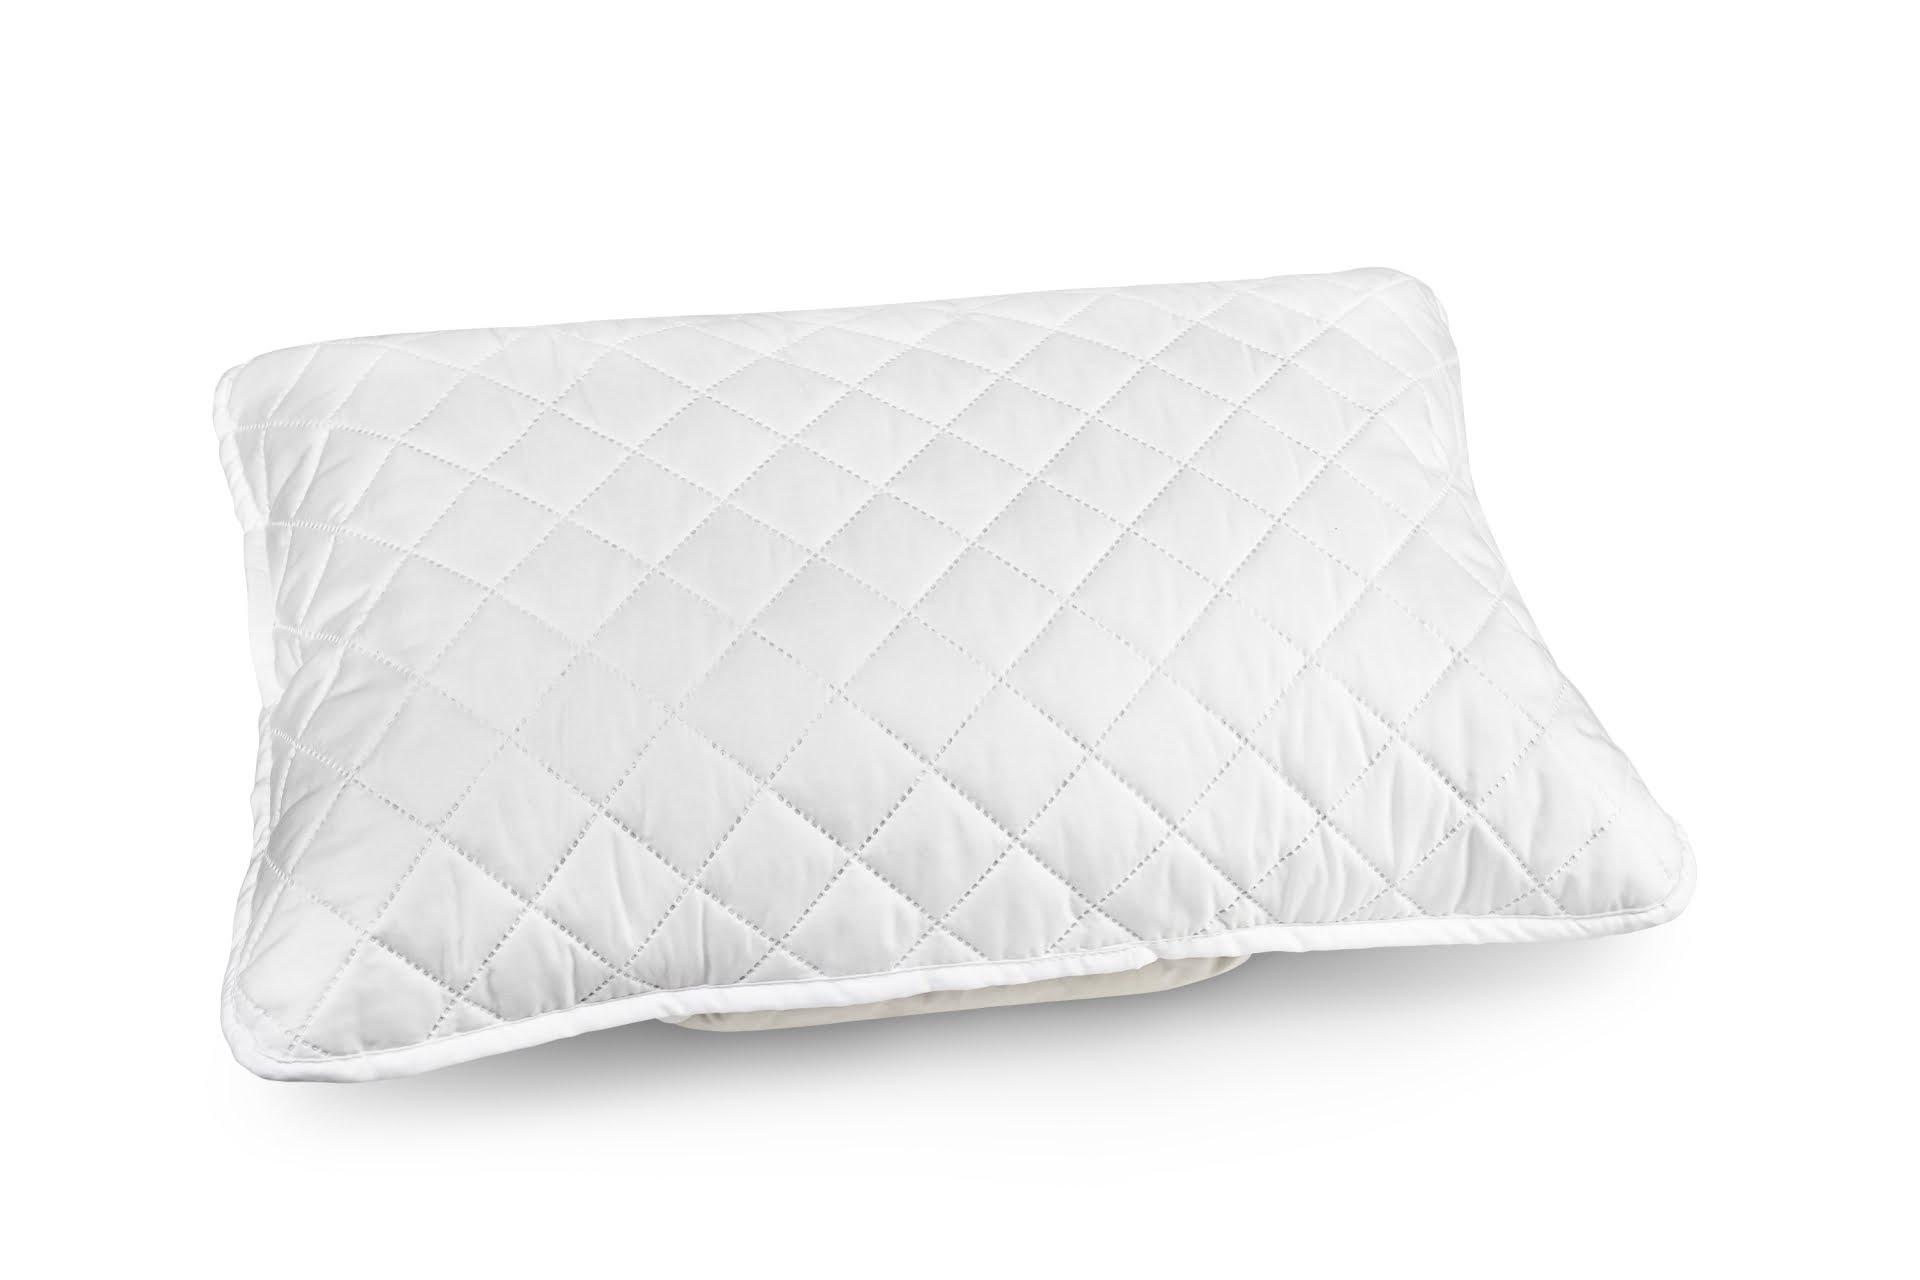 Protectie (fata de perna) matlasata HypoallergenicMed pentru perna 50x70 cm poza somnart.ro